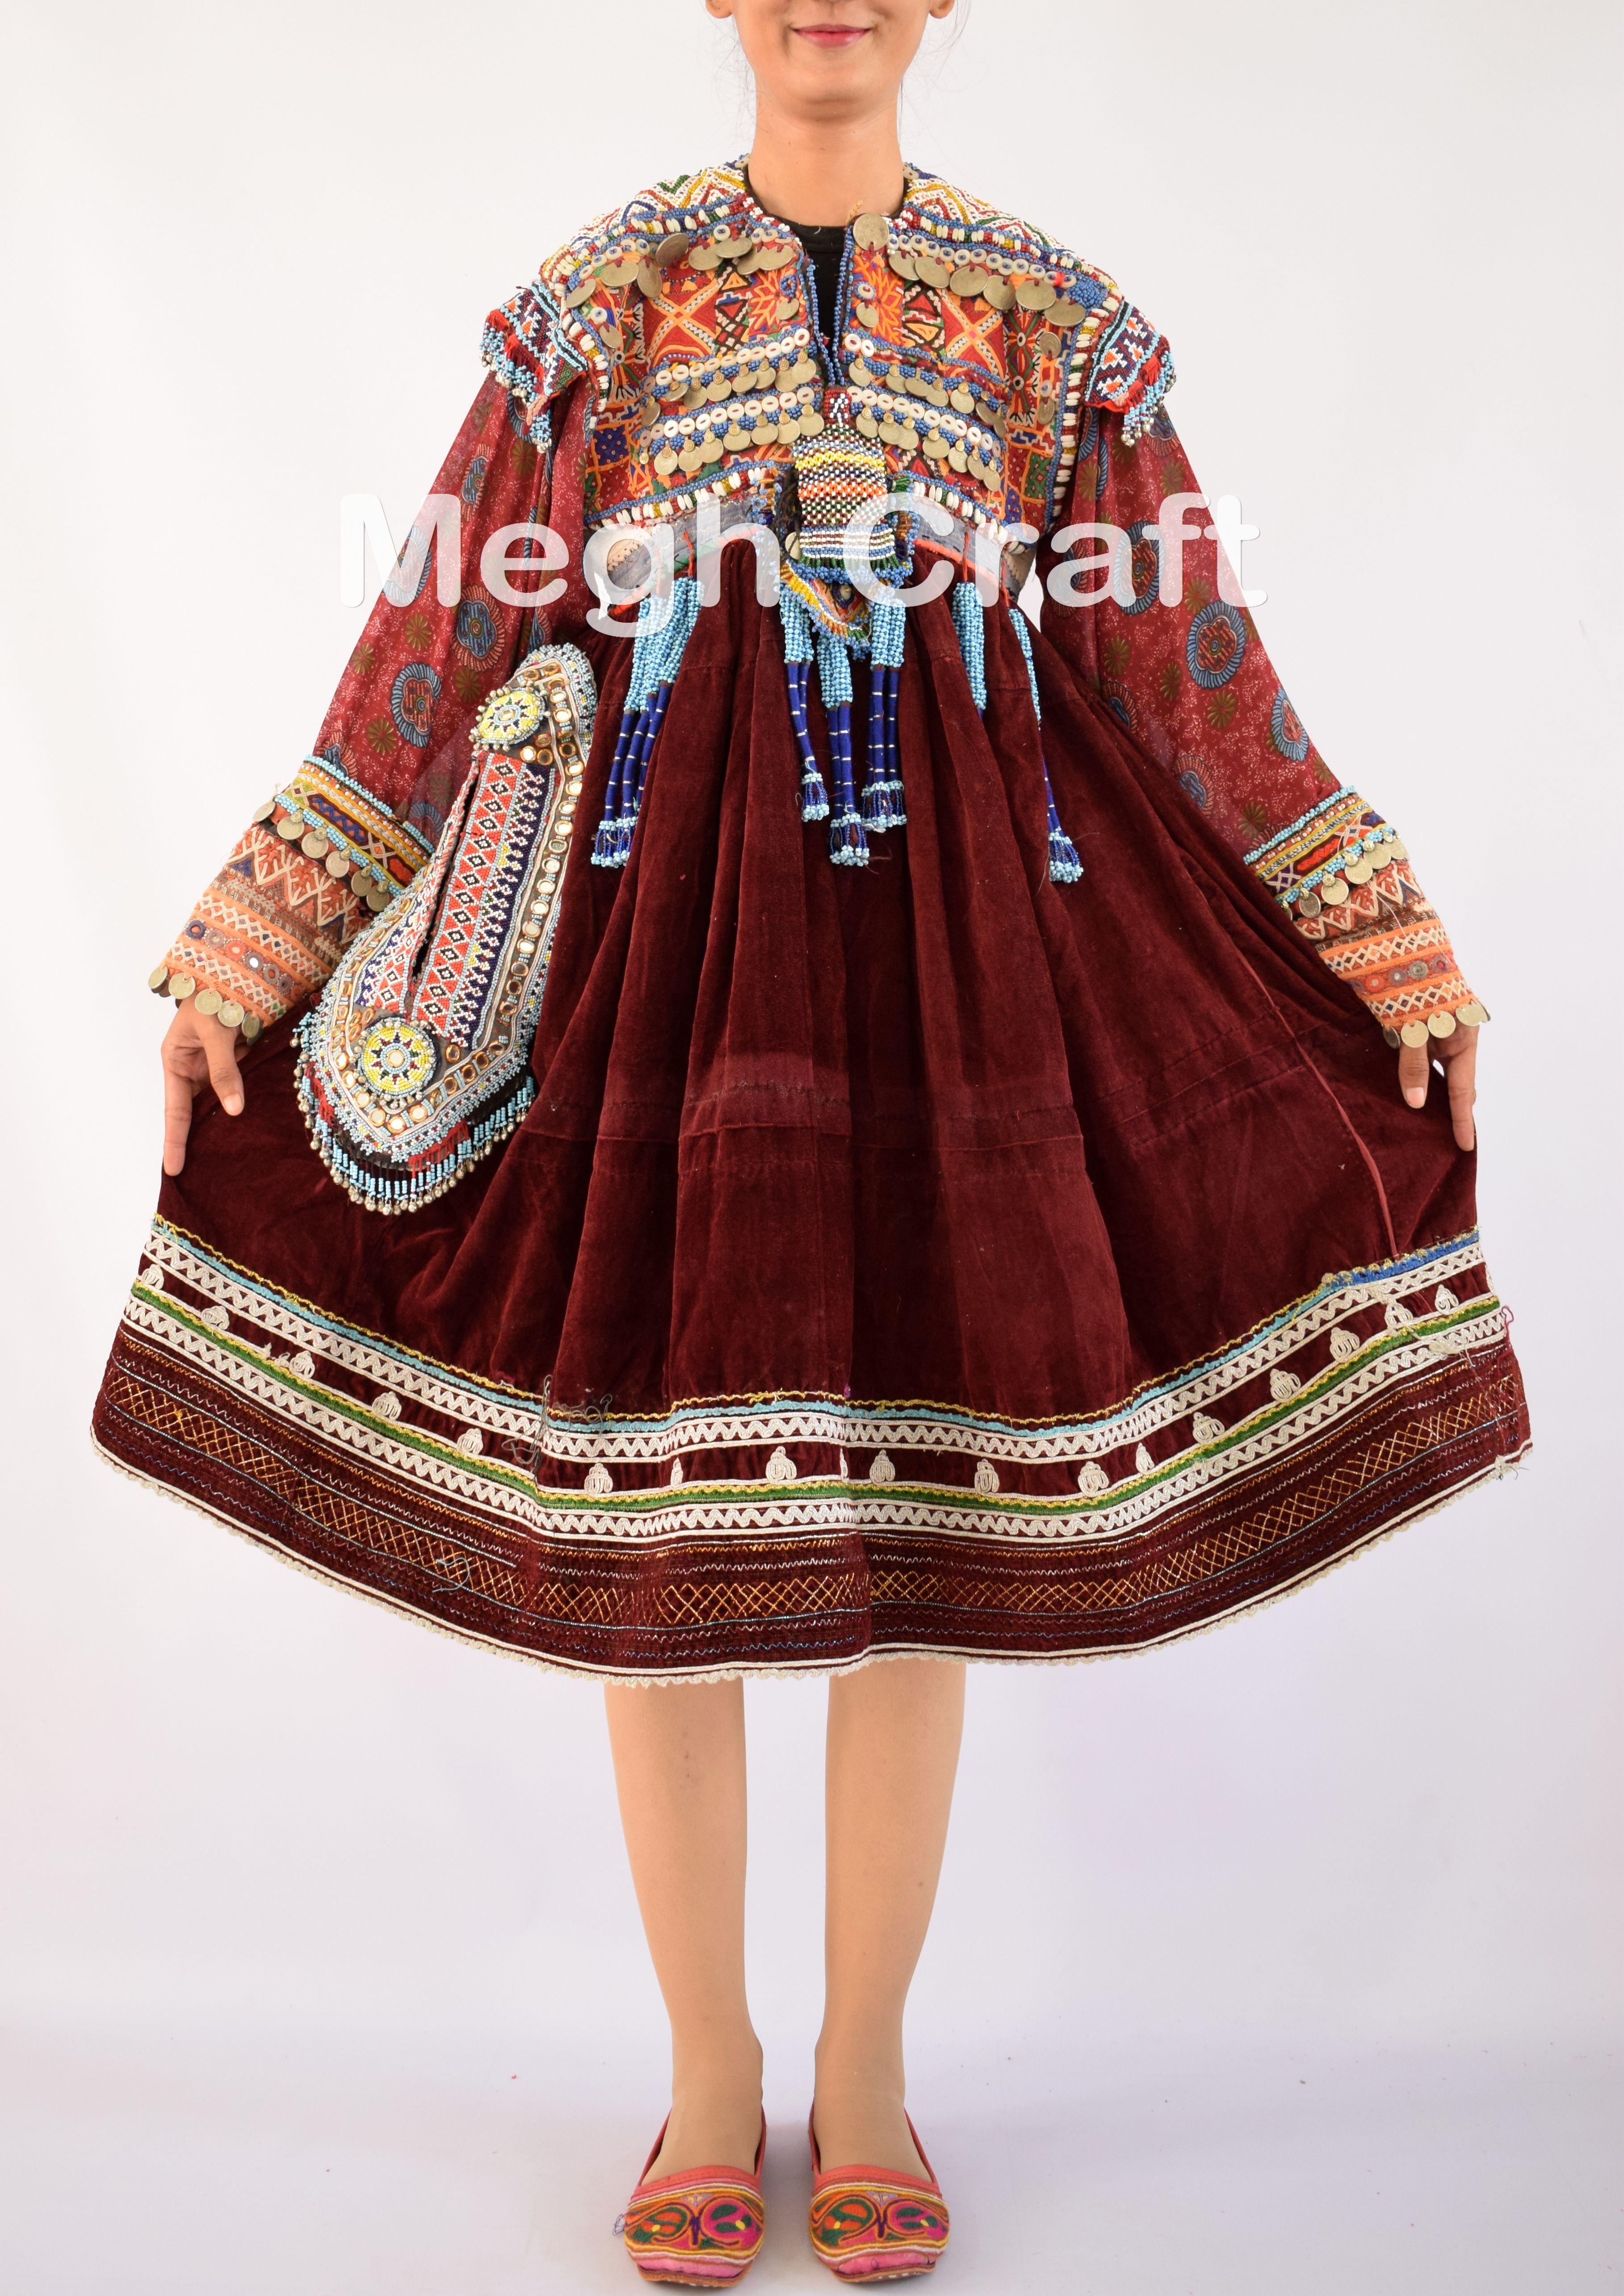 14982b592fb Afghani Dress - Vintage Coins Dress -Woman Fashion Beaded Embroidered Dress  -Kuchi Dress BY#craftnfashion #meghcraft #vintagecraft#indiancrafts# ...